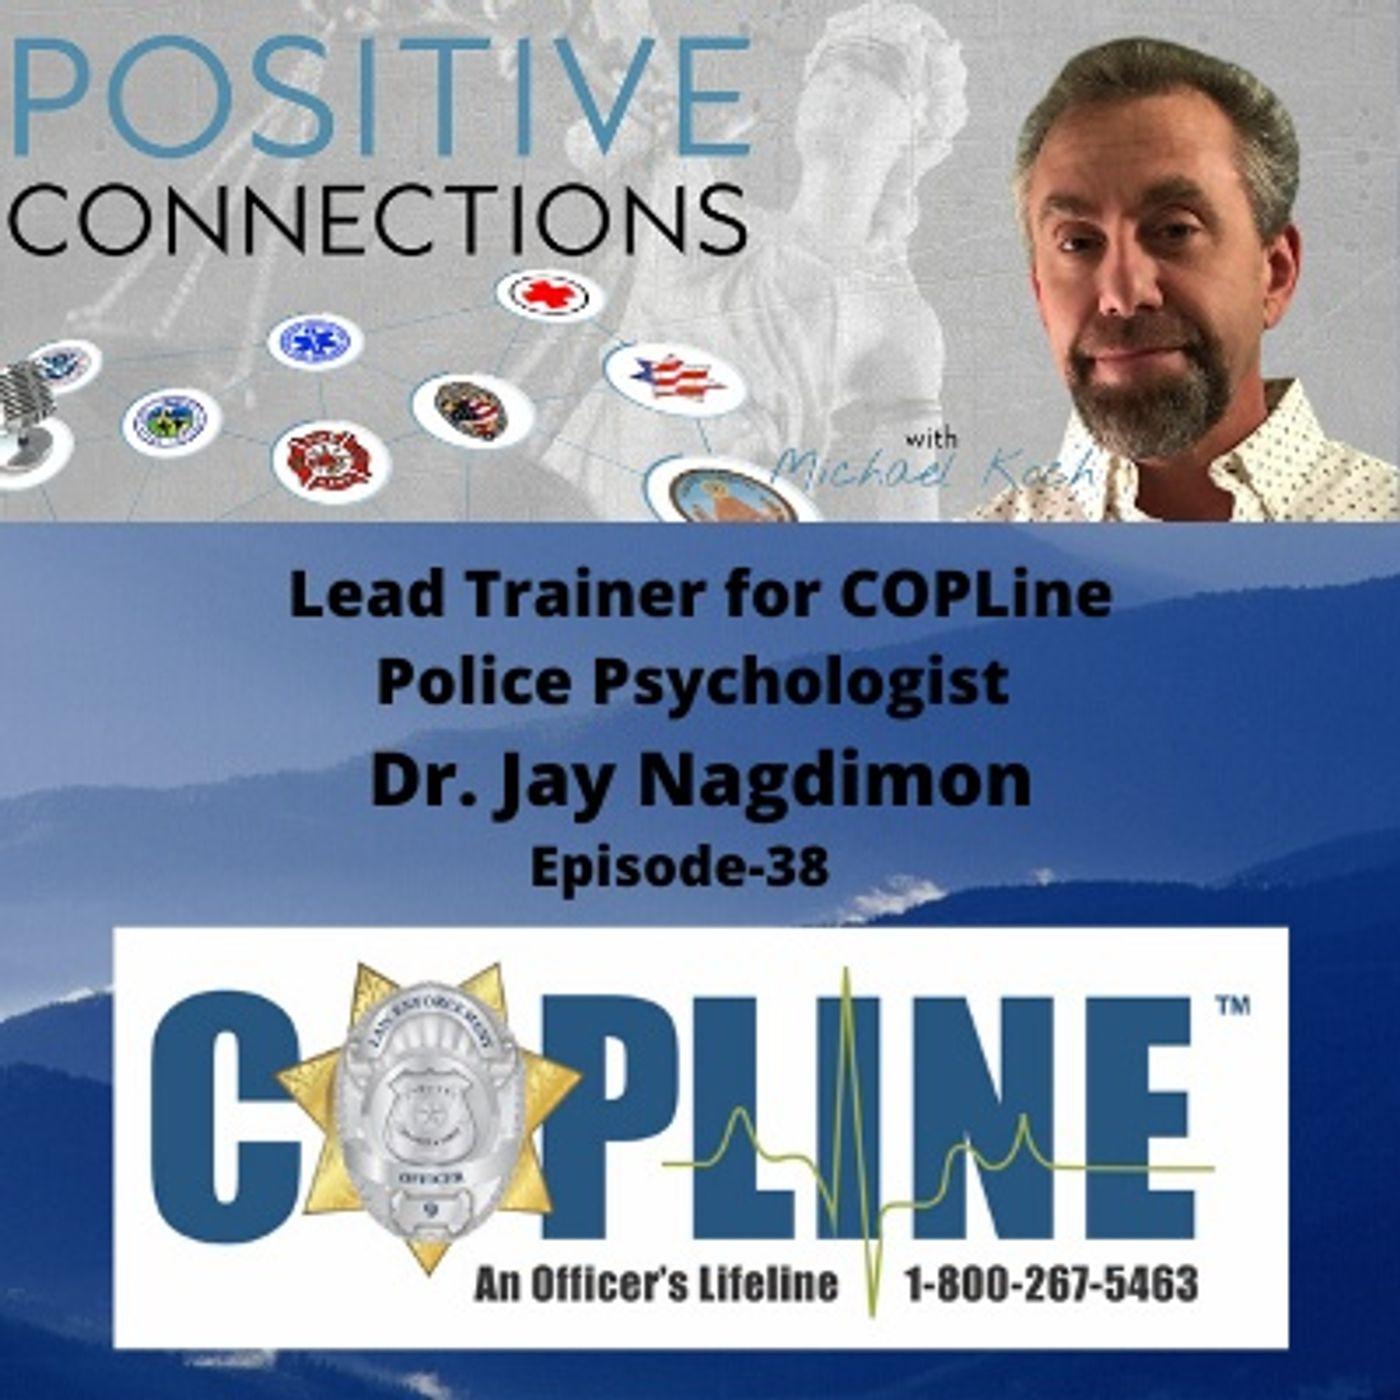 Lead Trainer for COPLine: Dr. Jay Nagdimon